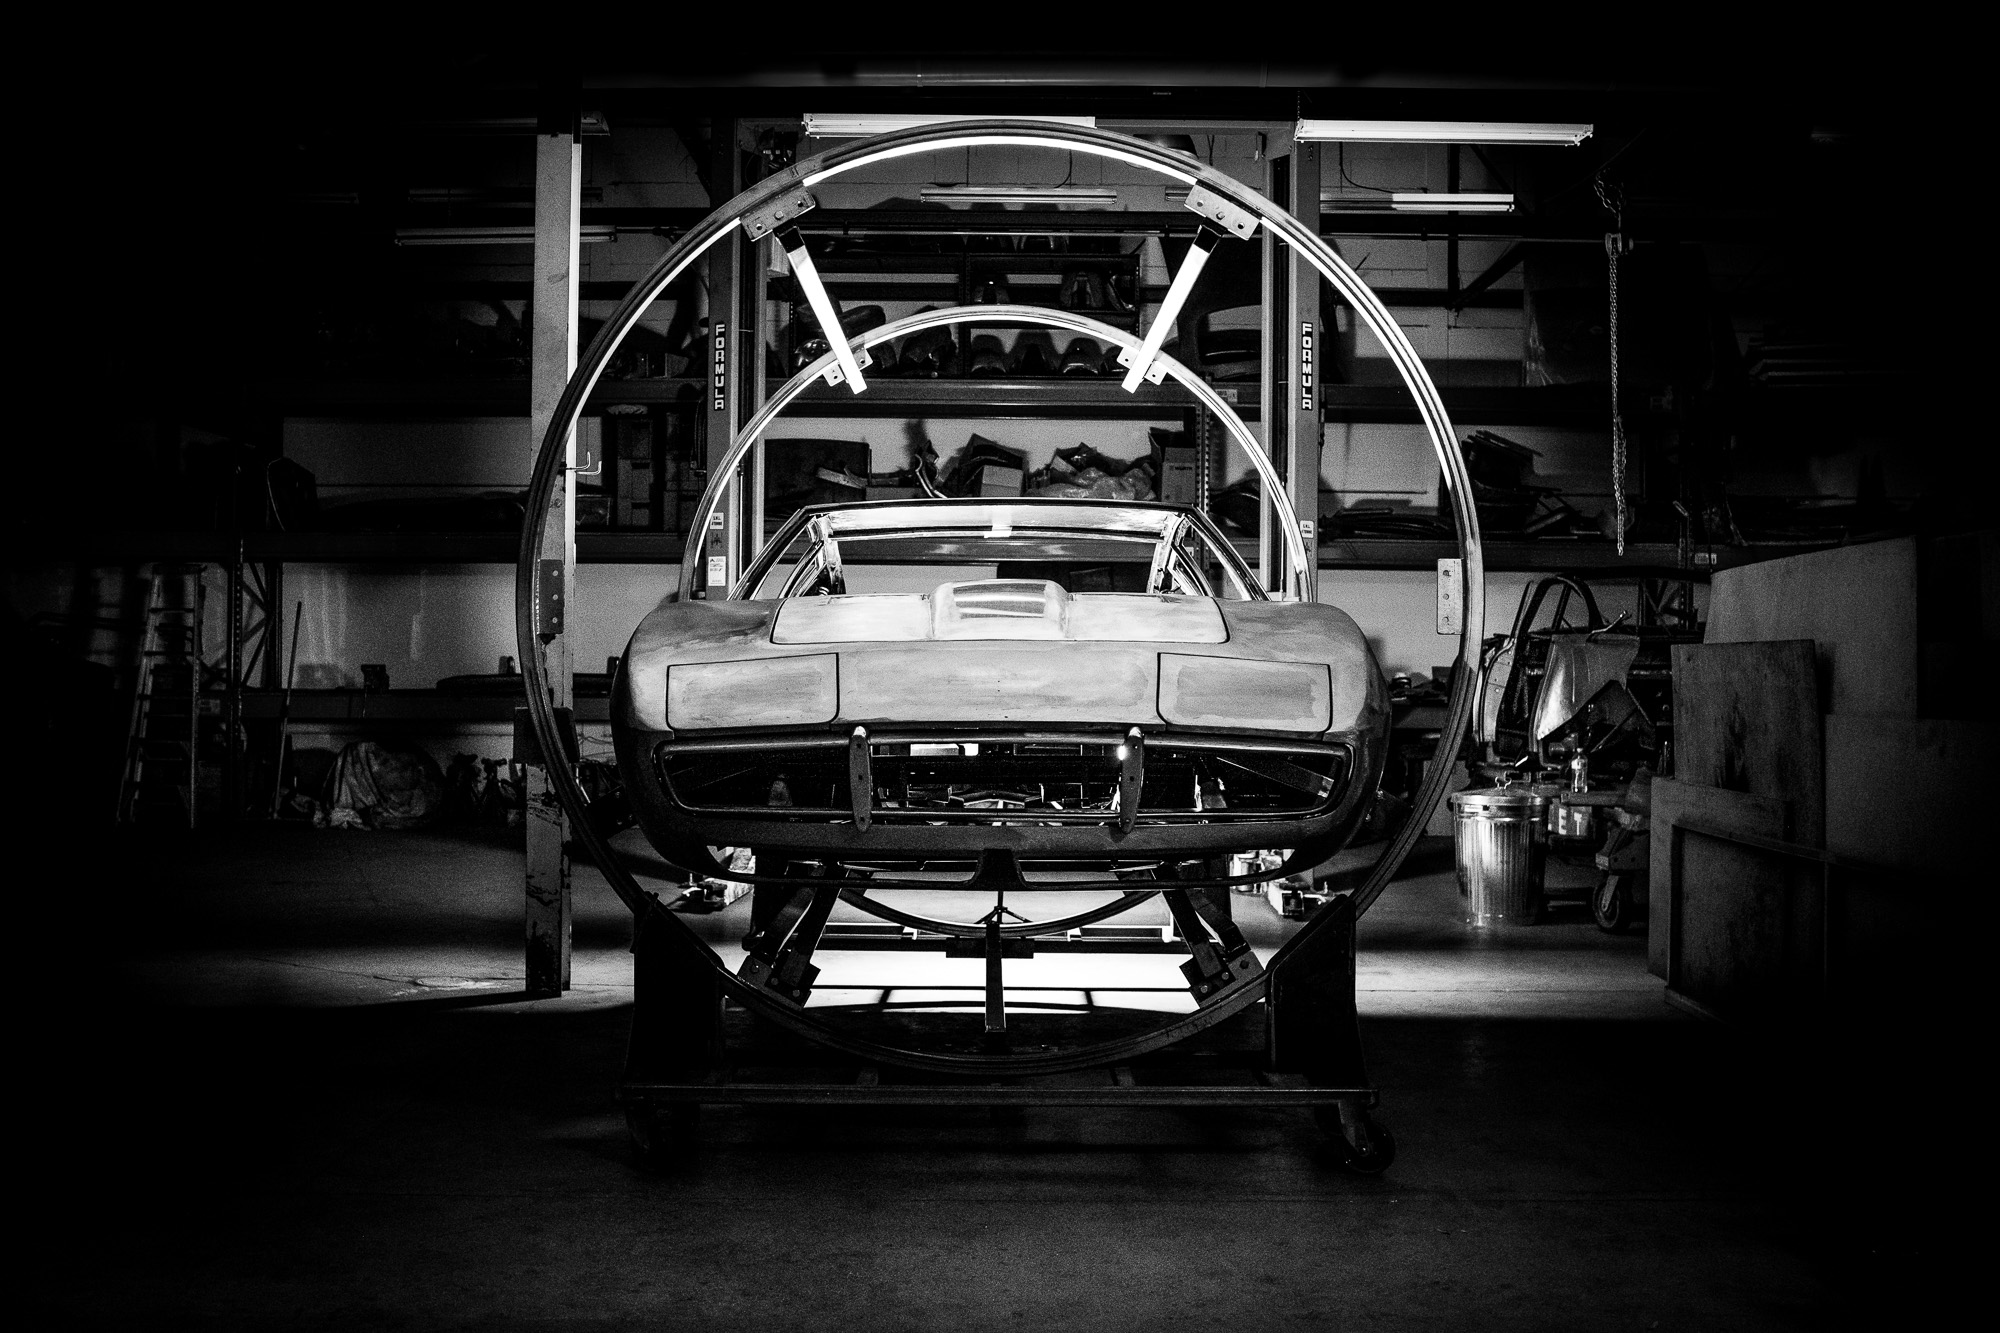 An early '70s Maserati Ghibli sports car undergoing restoration at MotorRetro Sydney